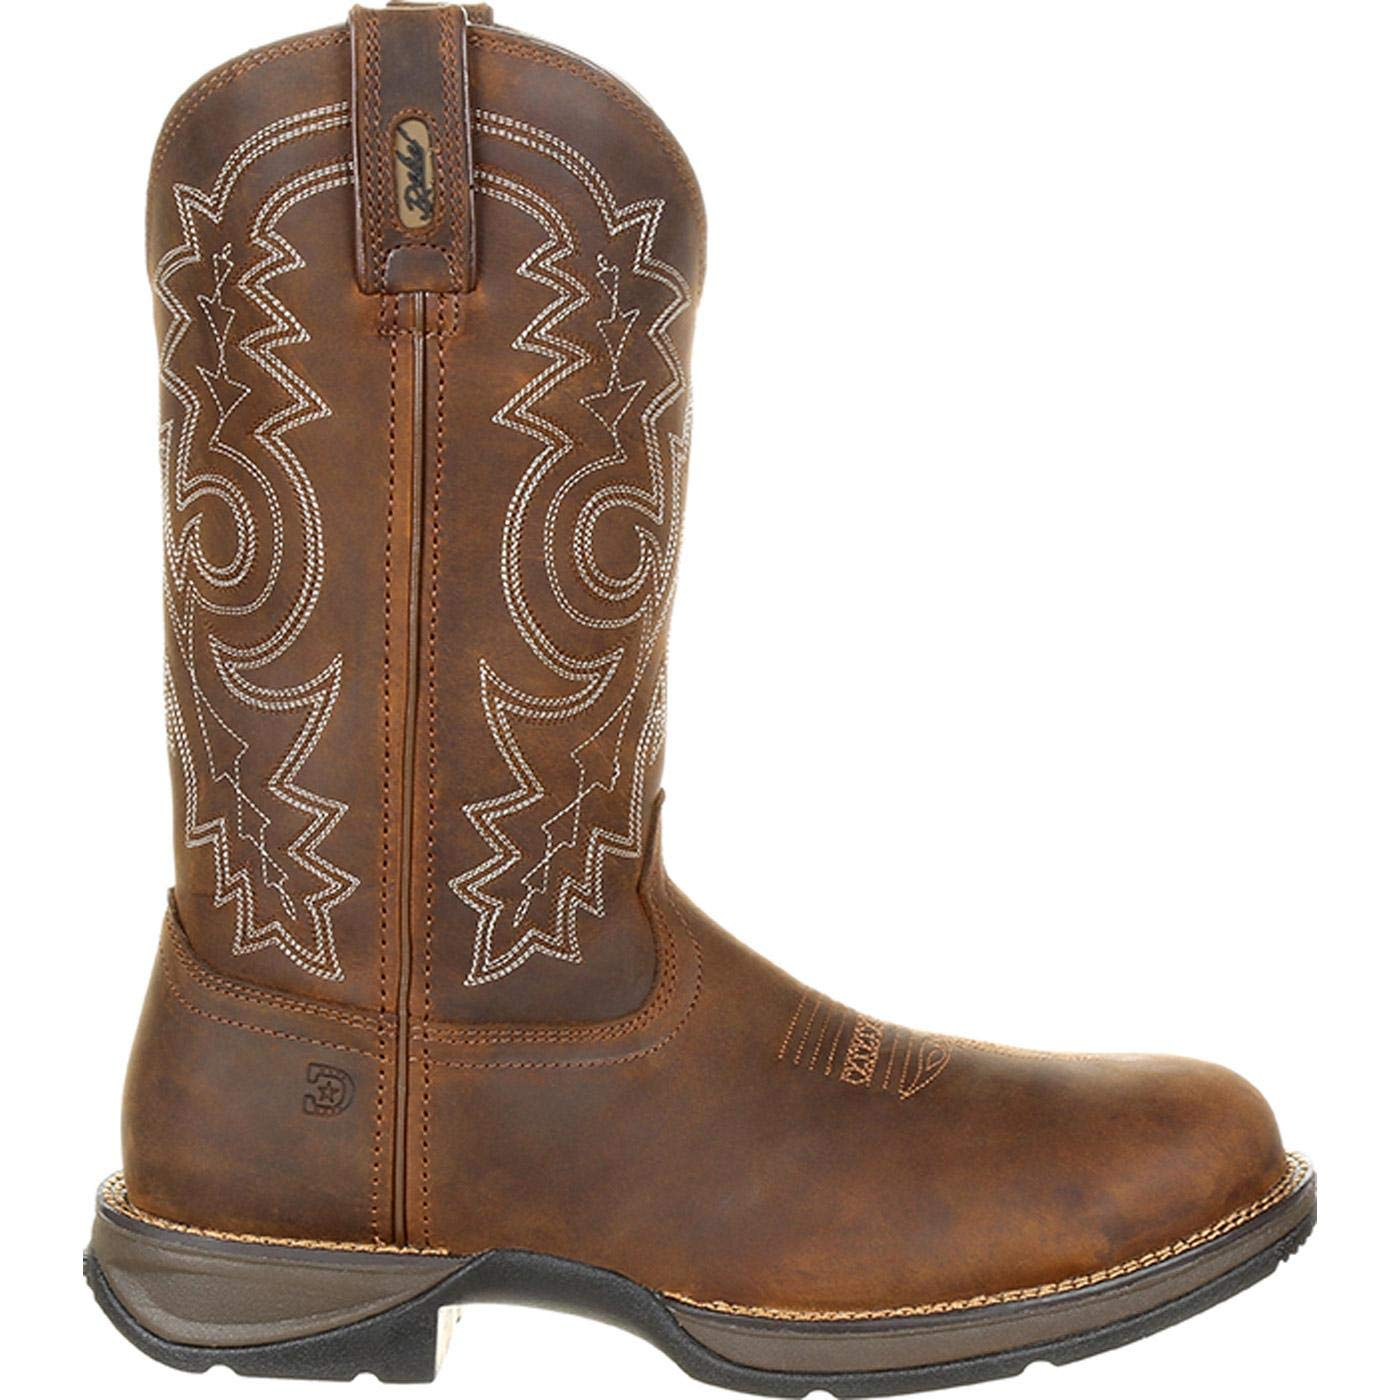 8e60f14b757 Durango Rebel Steel Toe Waterproof Western Work Boot Coyote Brown